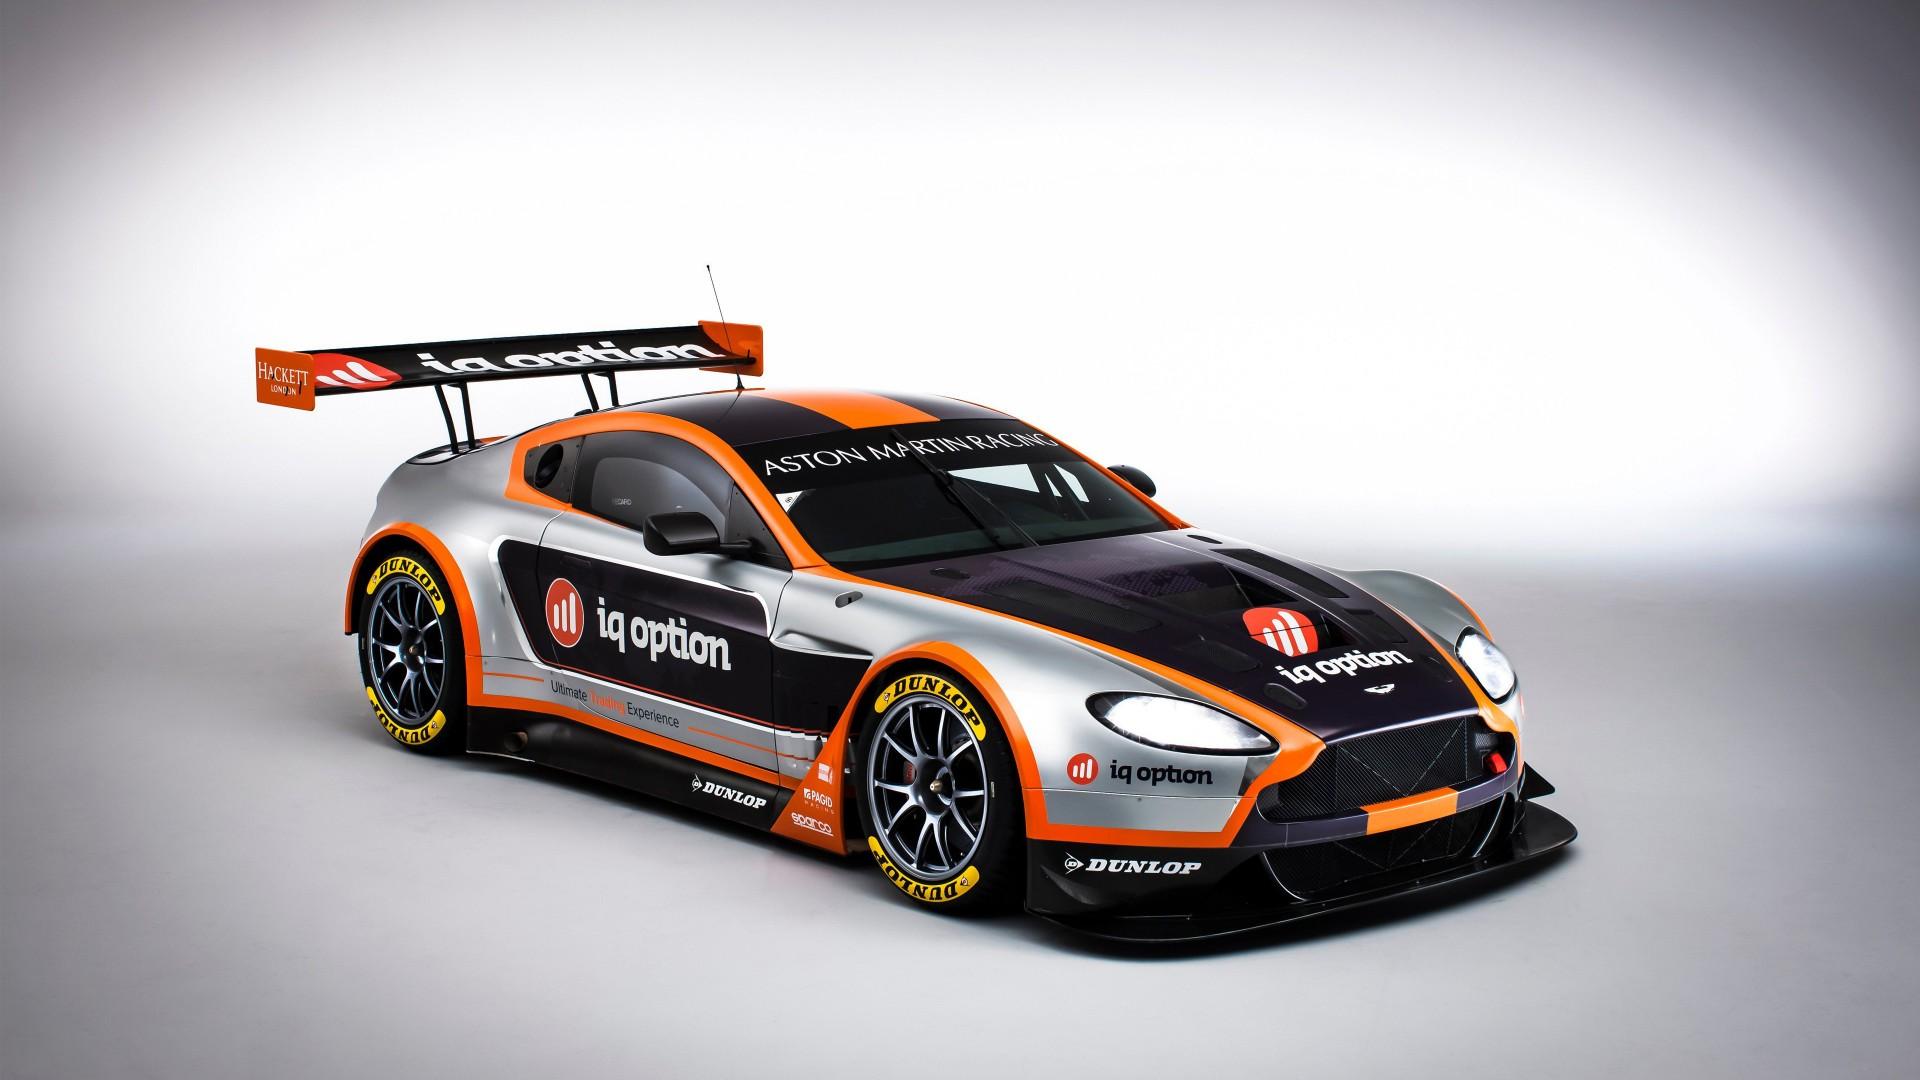 Wallpaper Android Motorsport: Aston Martin Racing Car Wallpaper